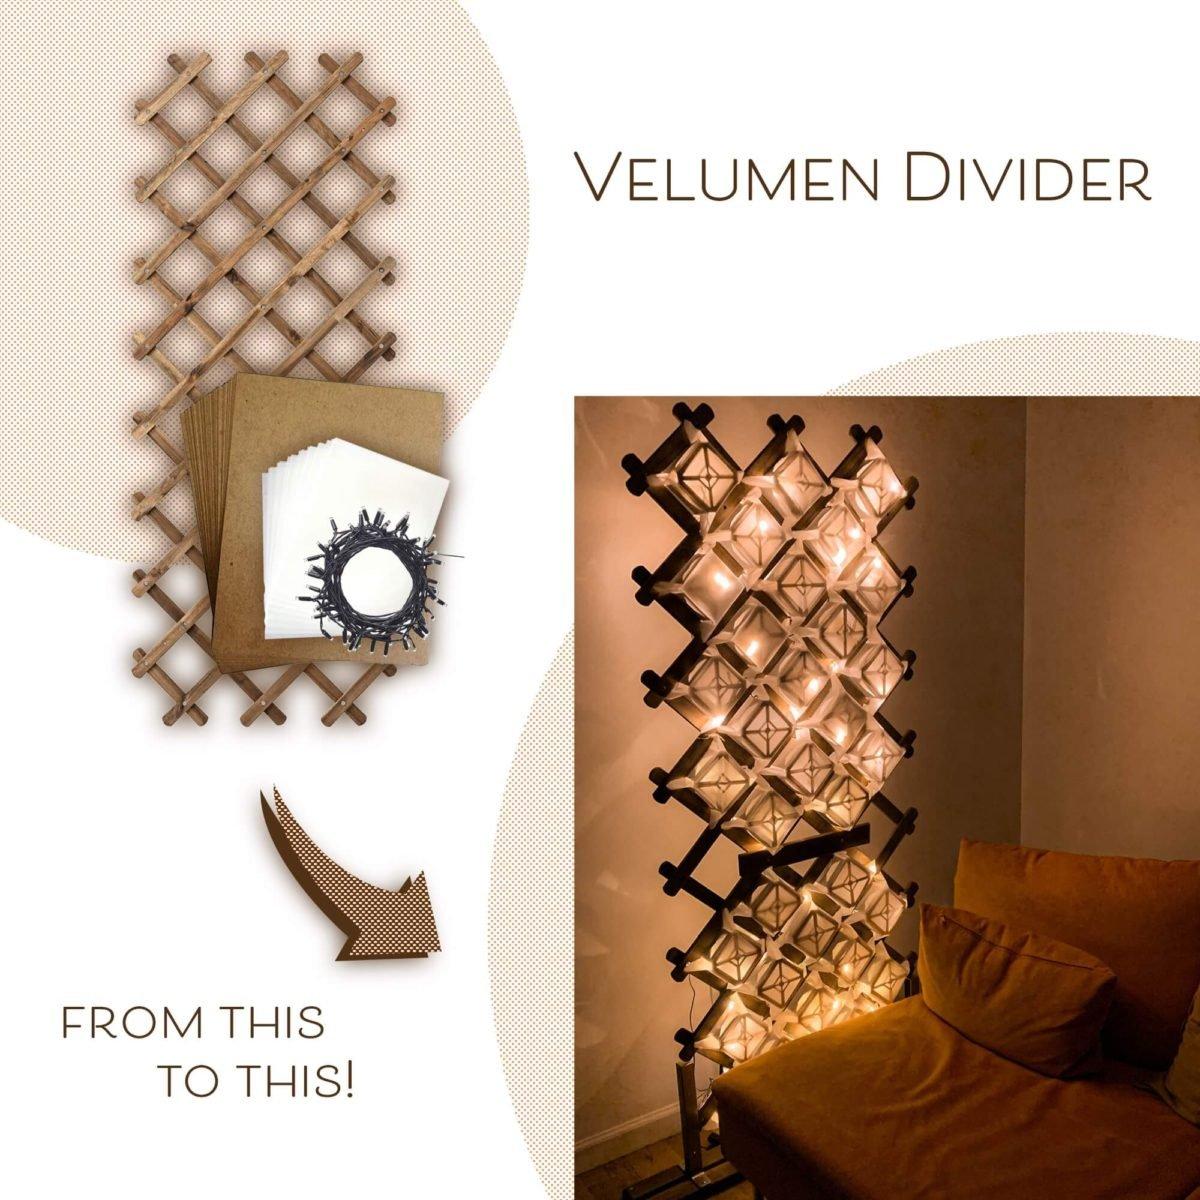 Velumen Lighted Room Divider